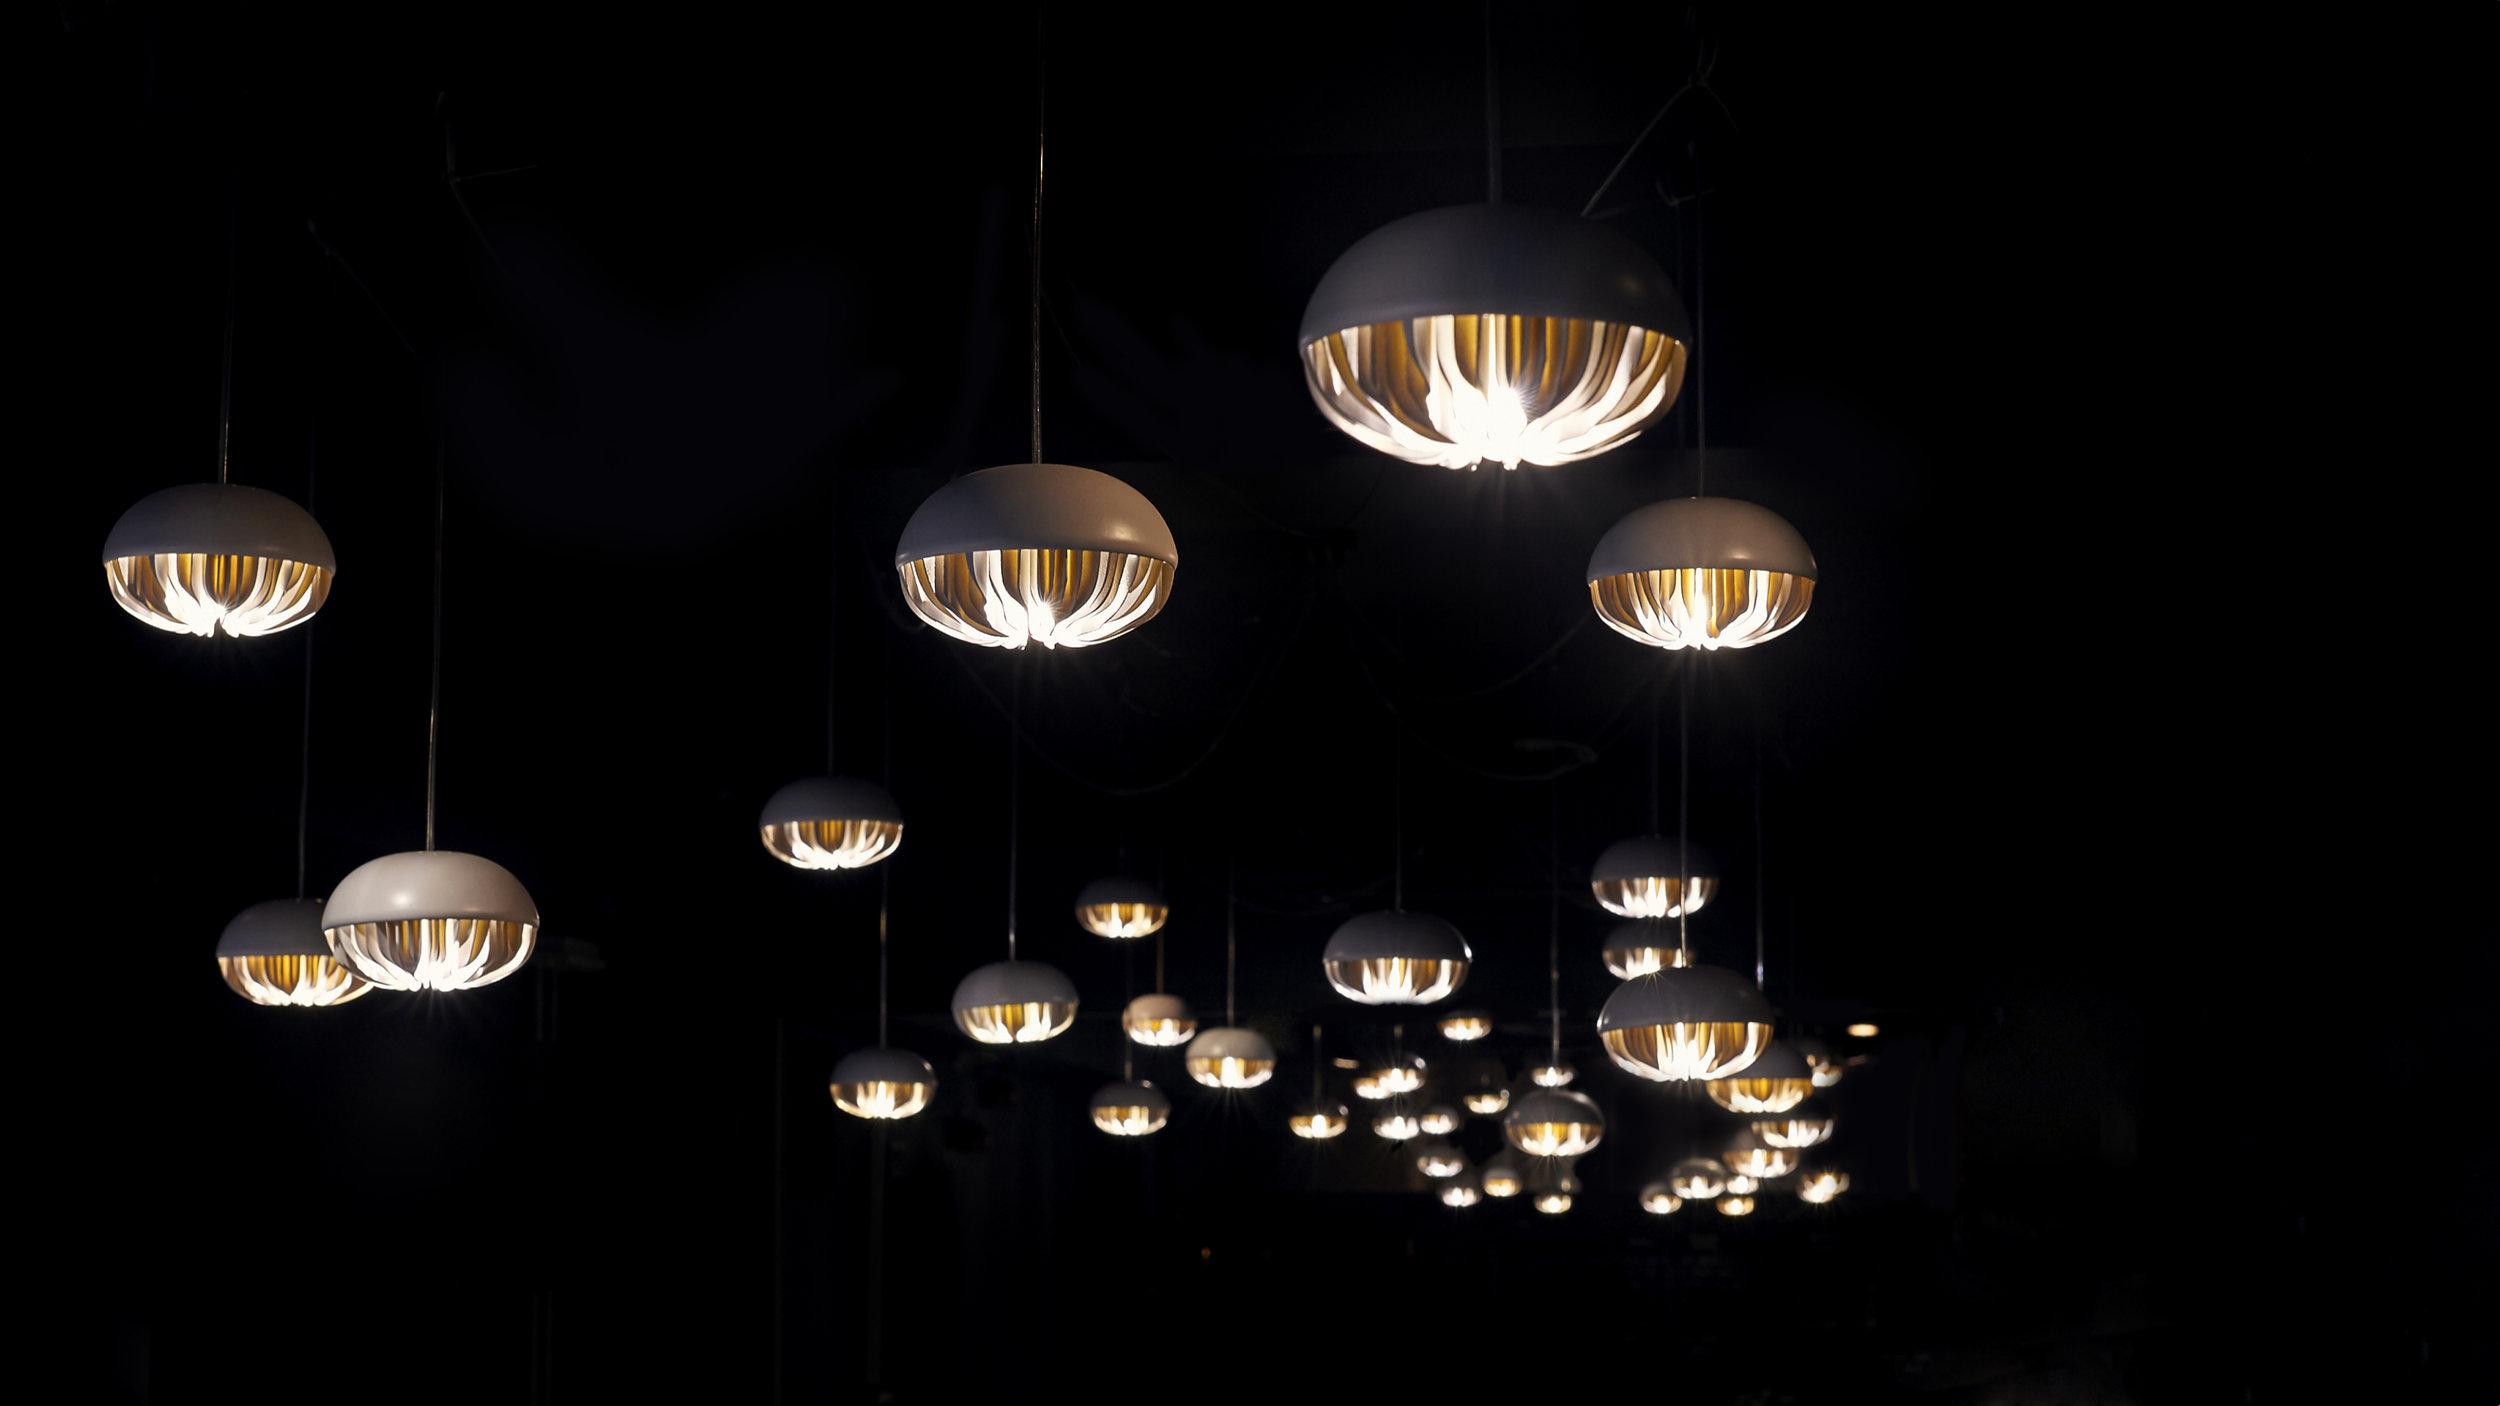 James-Plant-Design-Studio-M-Lamp-Chandelier - Copy.jpg